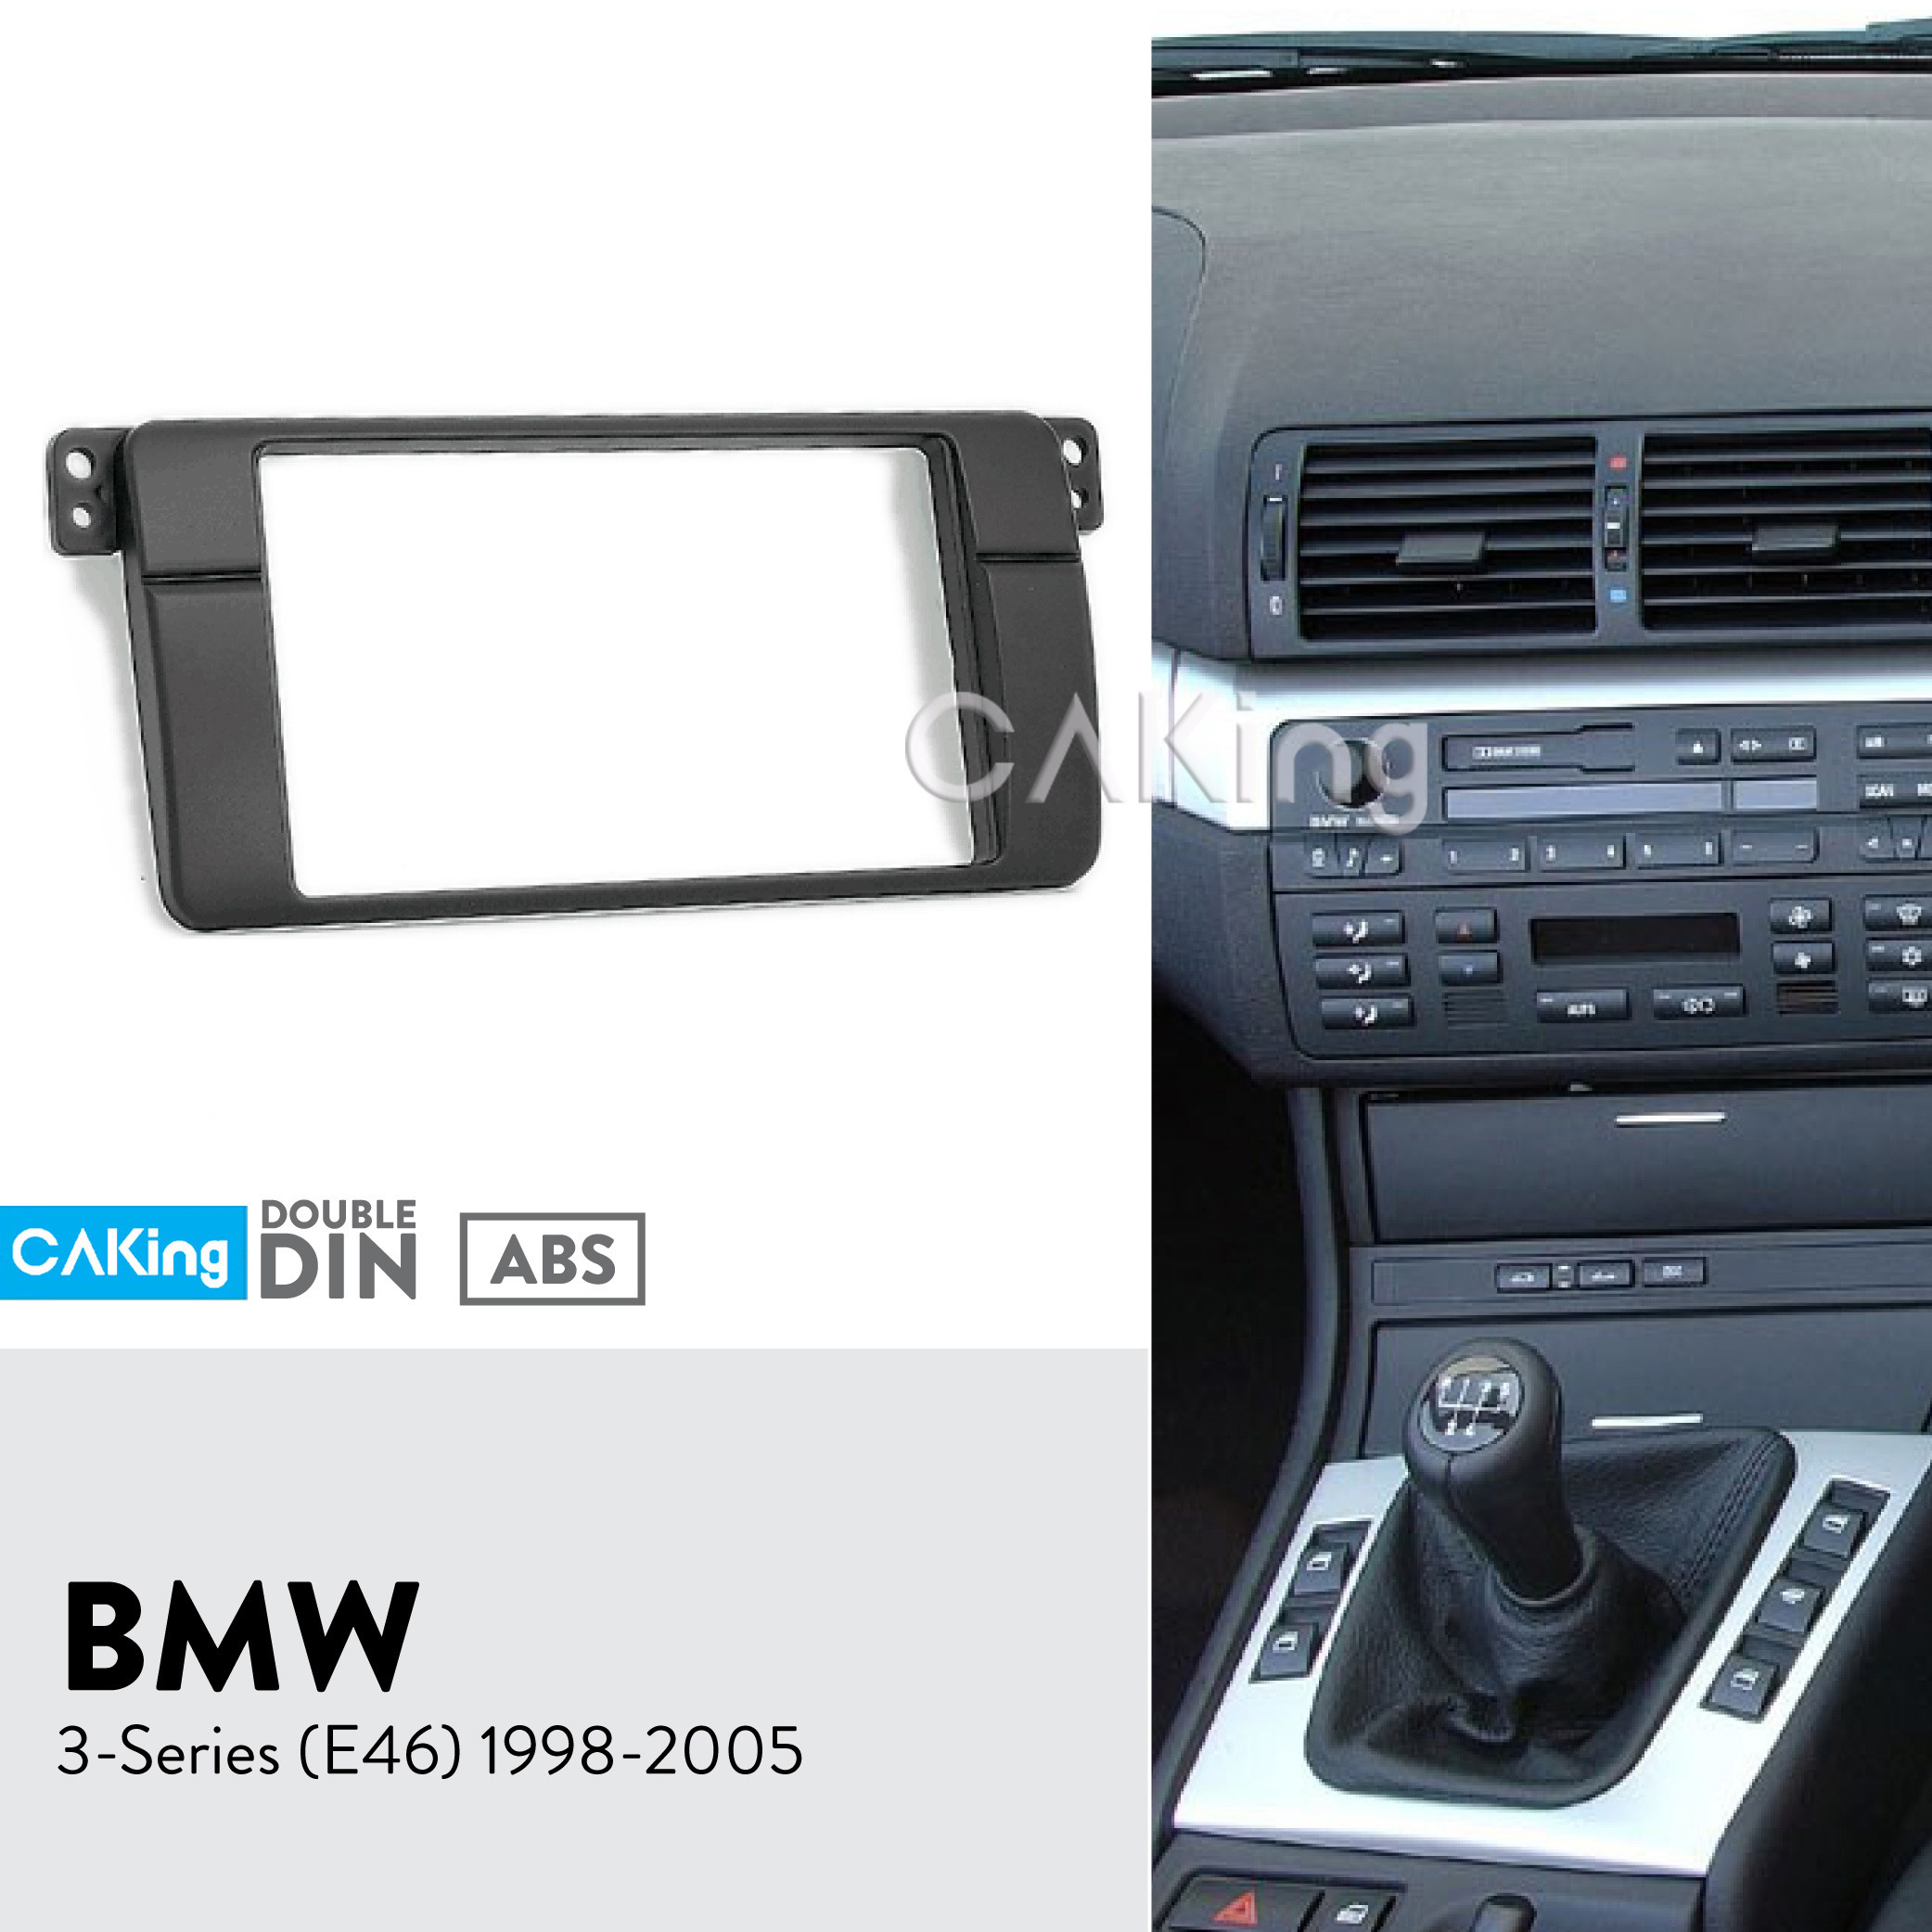 BMW E46 Double Din Car Fascia Radio Holder Stereo Cage